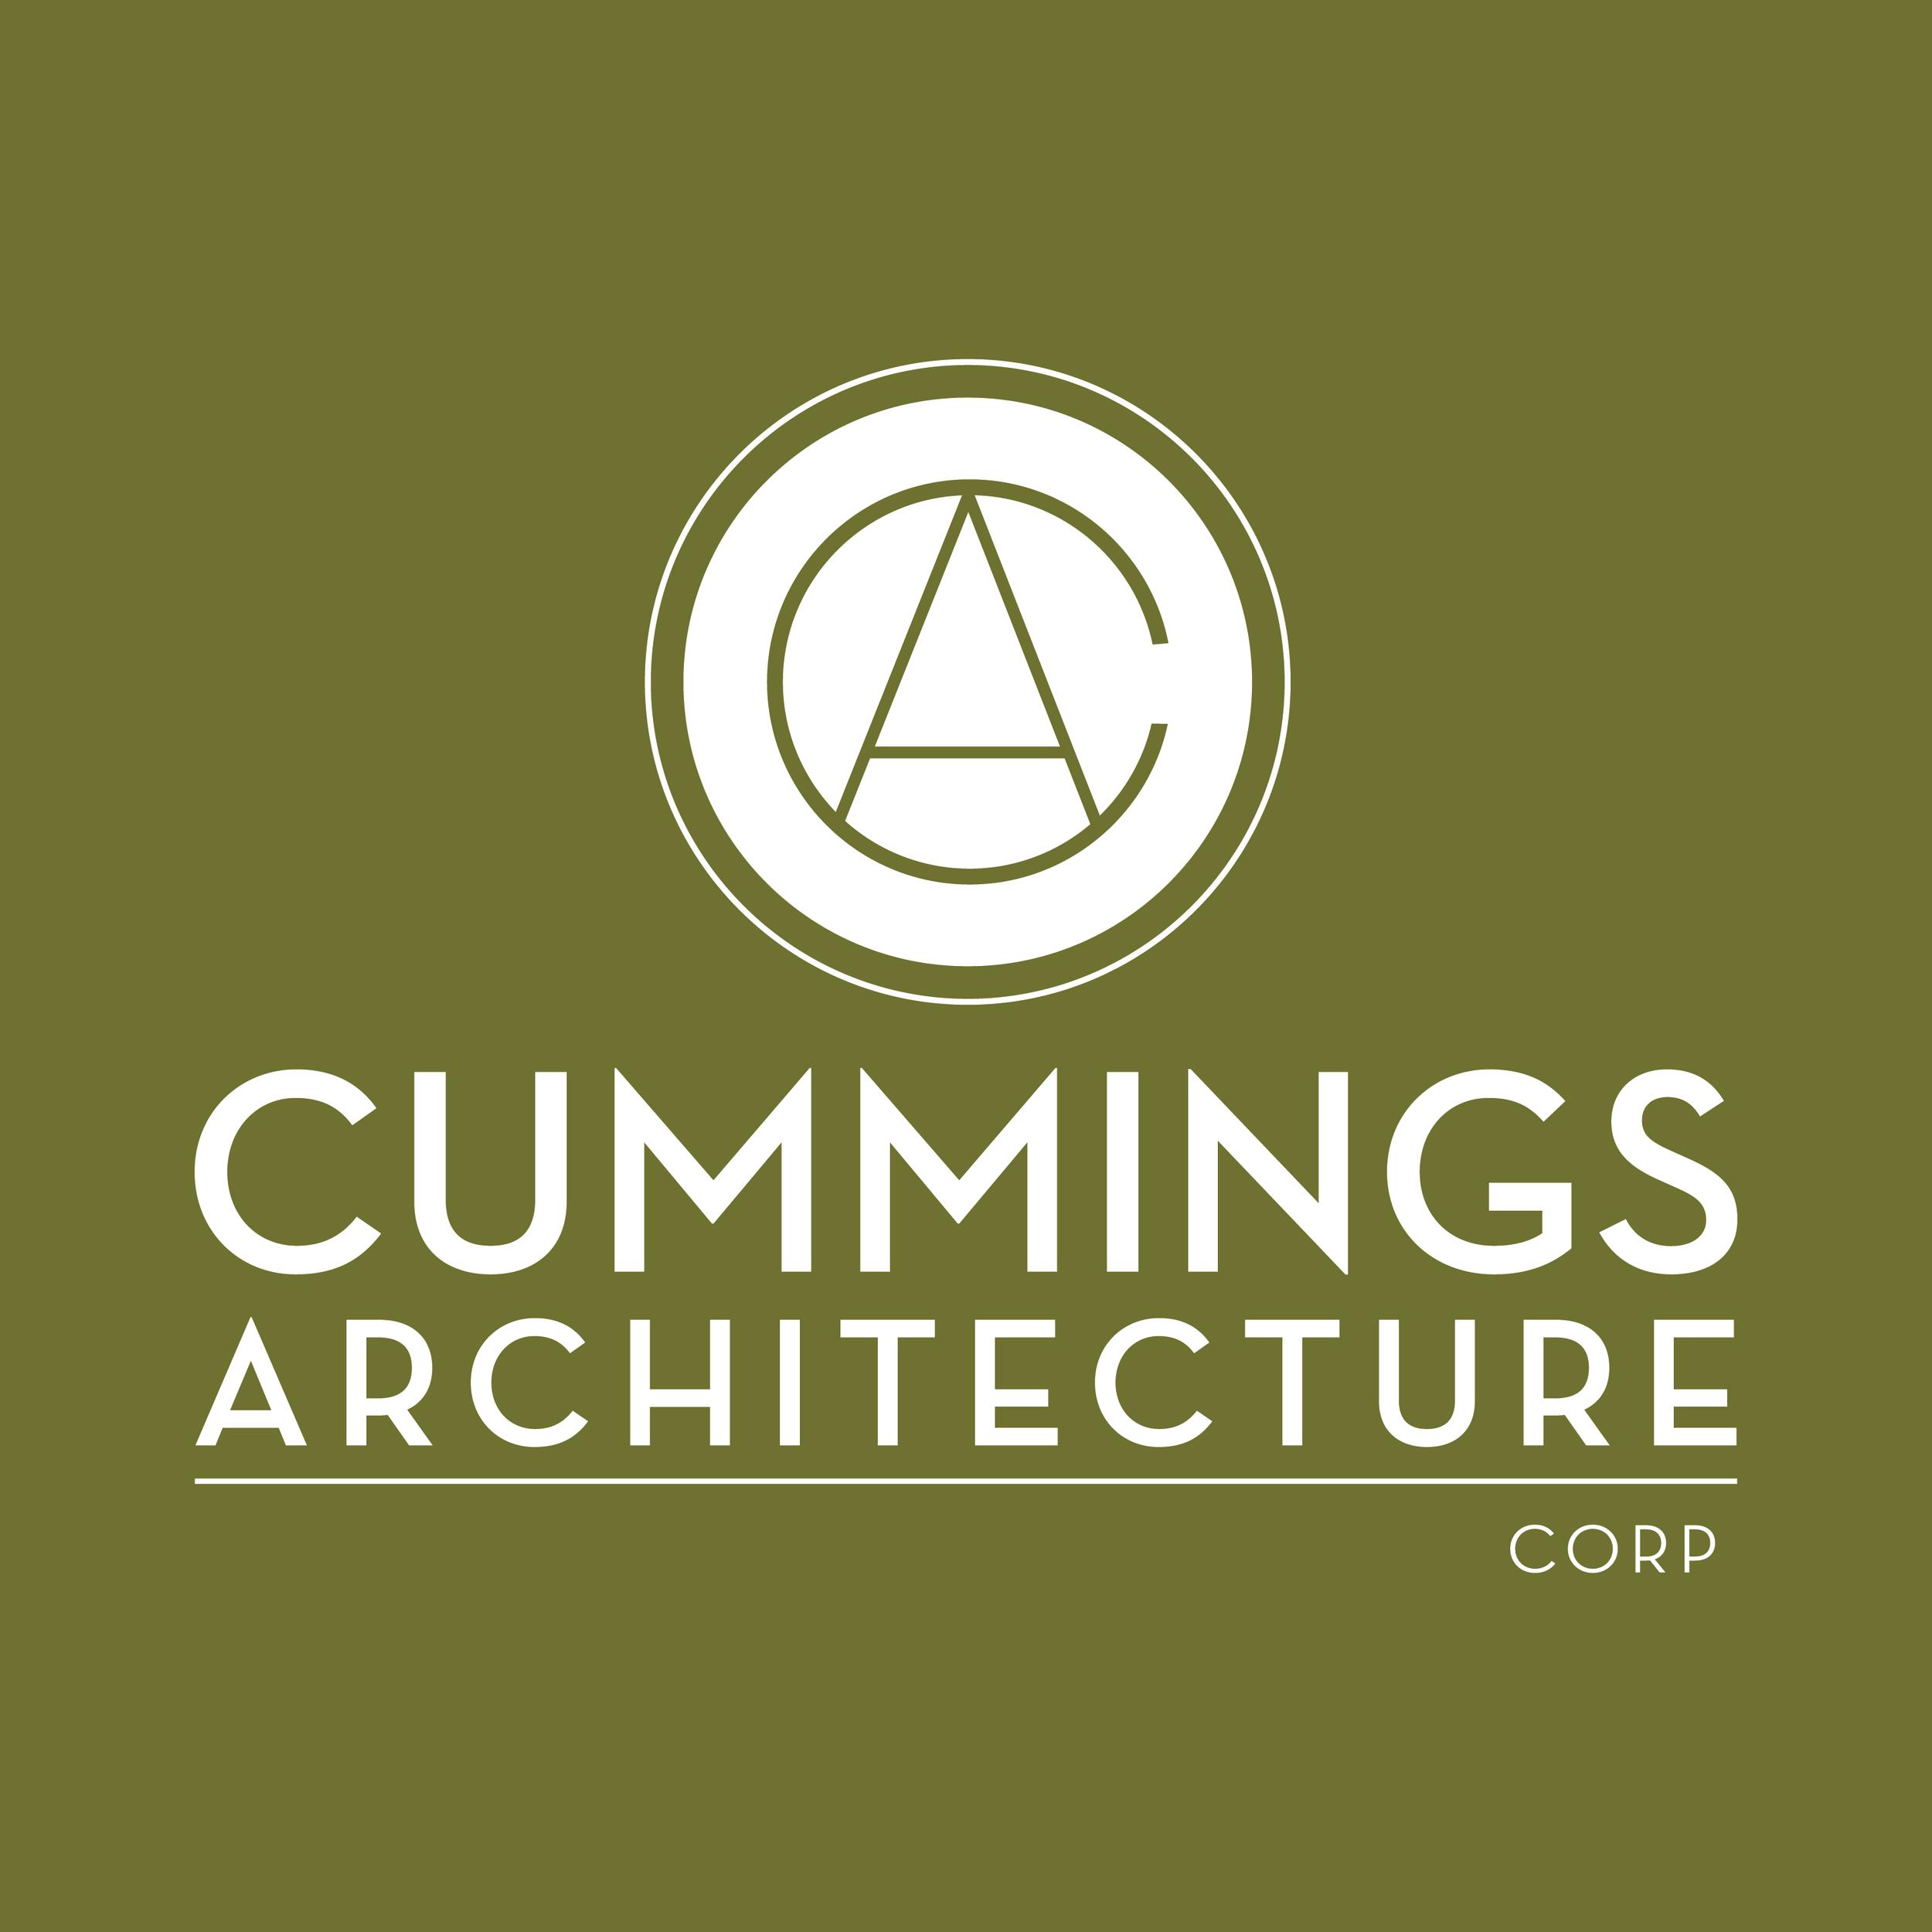 Cummings Architecture Corp    brand // print